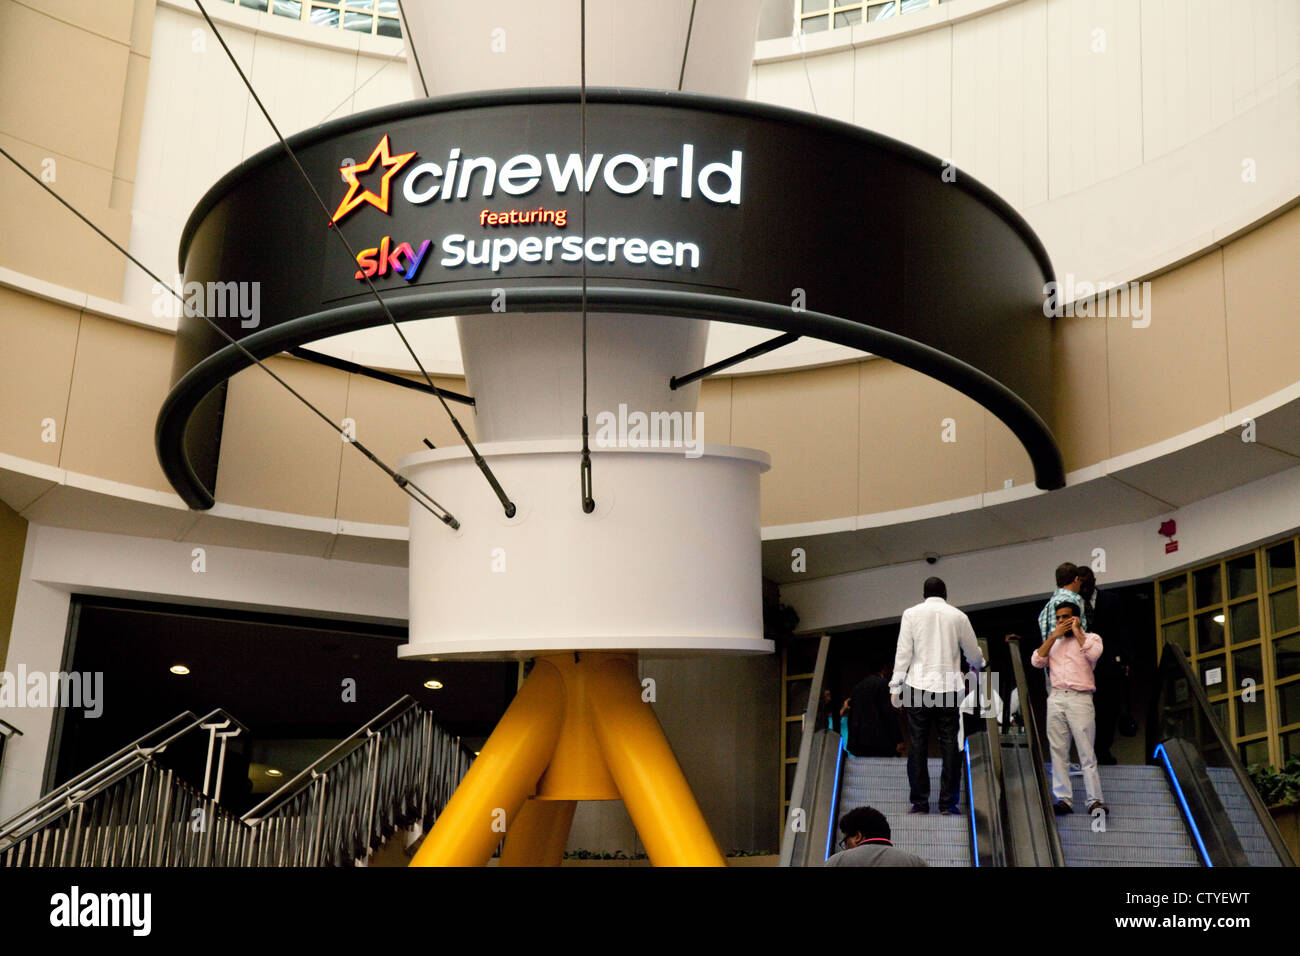 Cineworld cinema sign, the O2 arena, london UK - Stock Image